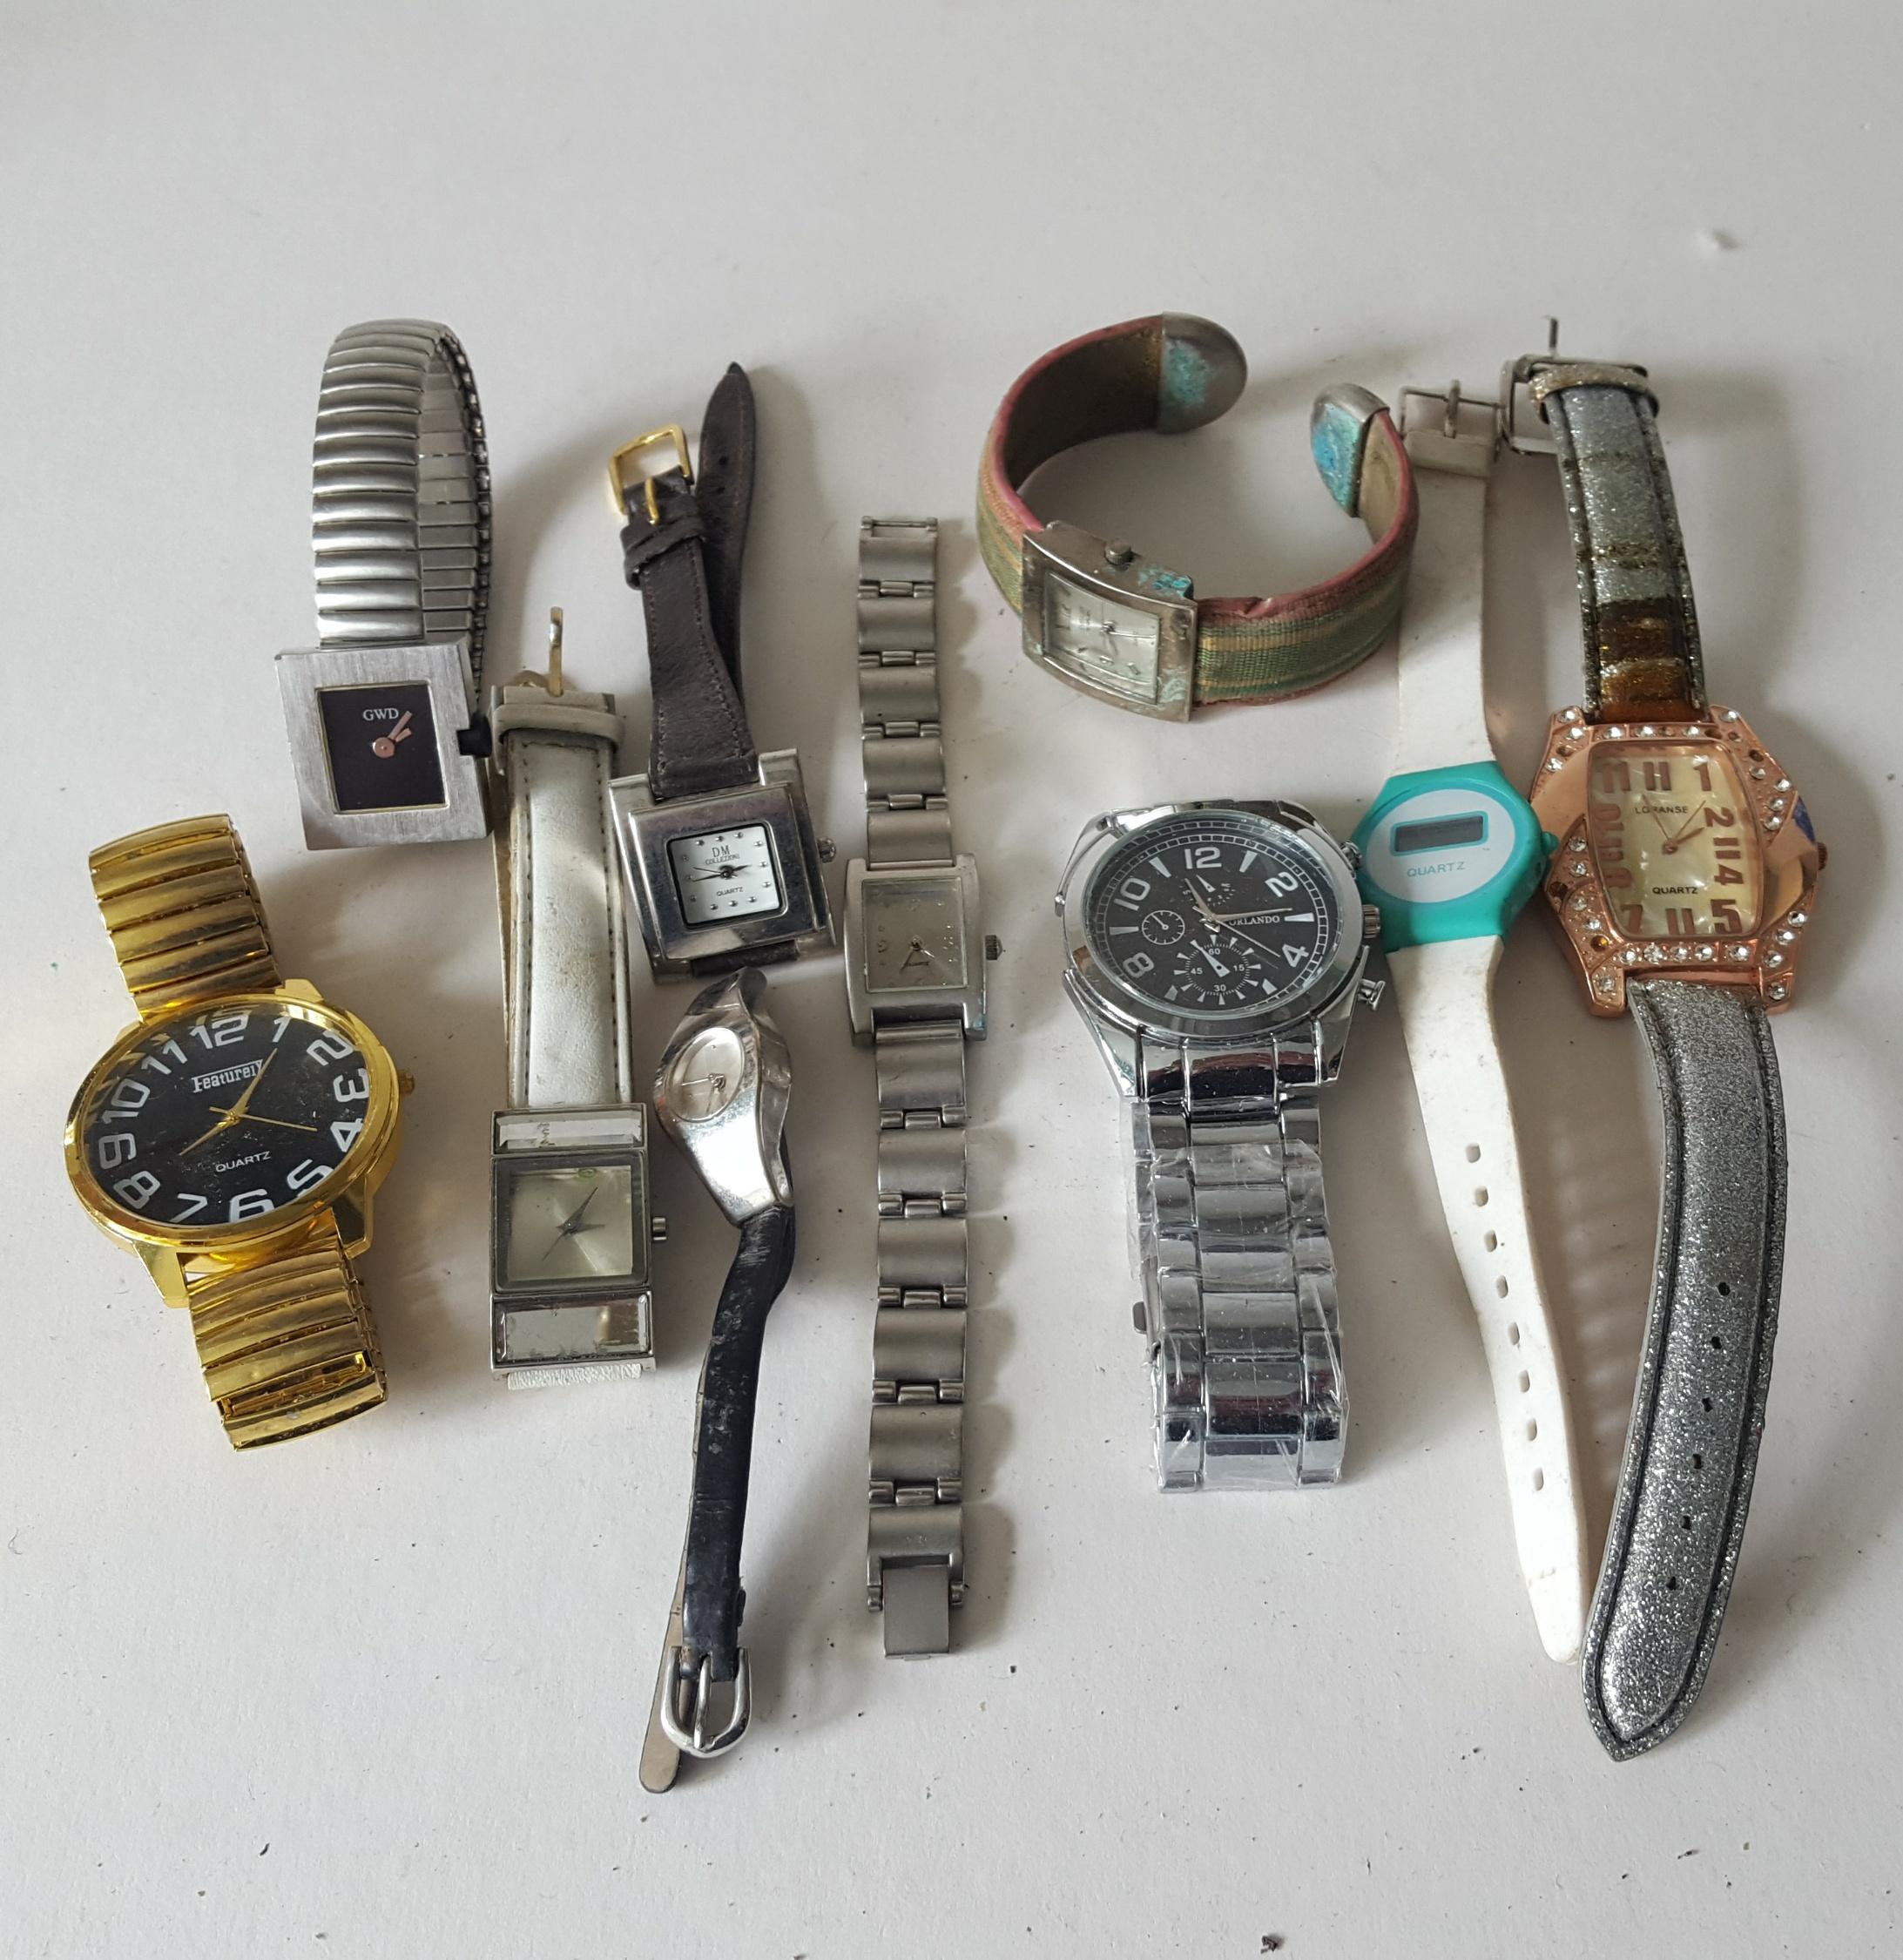 Lot 77 - Vintage Retro Parcel of 10 Assorted Wrist Watches NO RESERVE